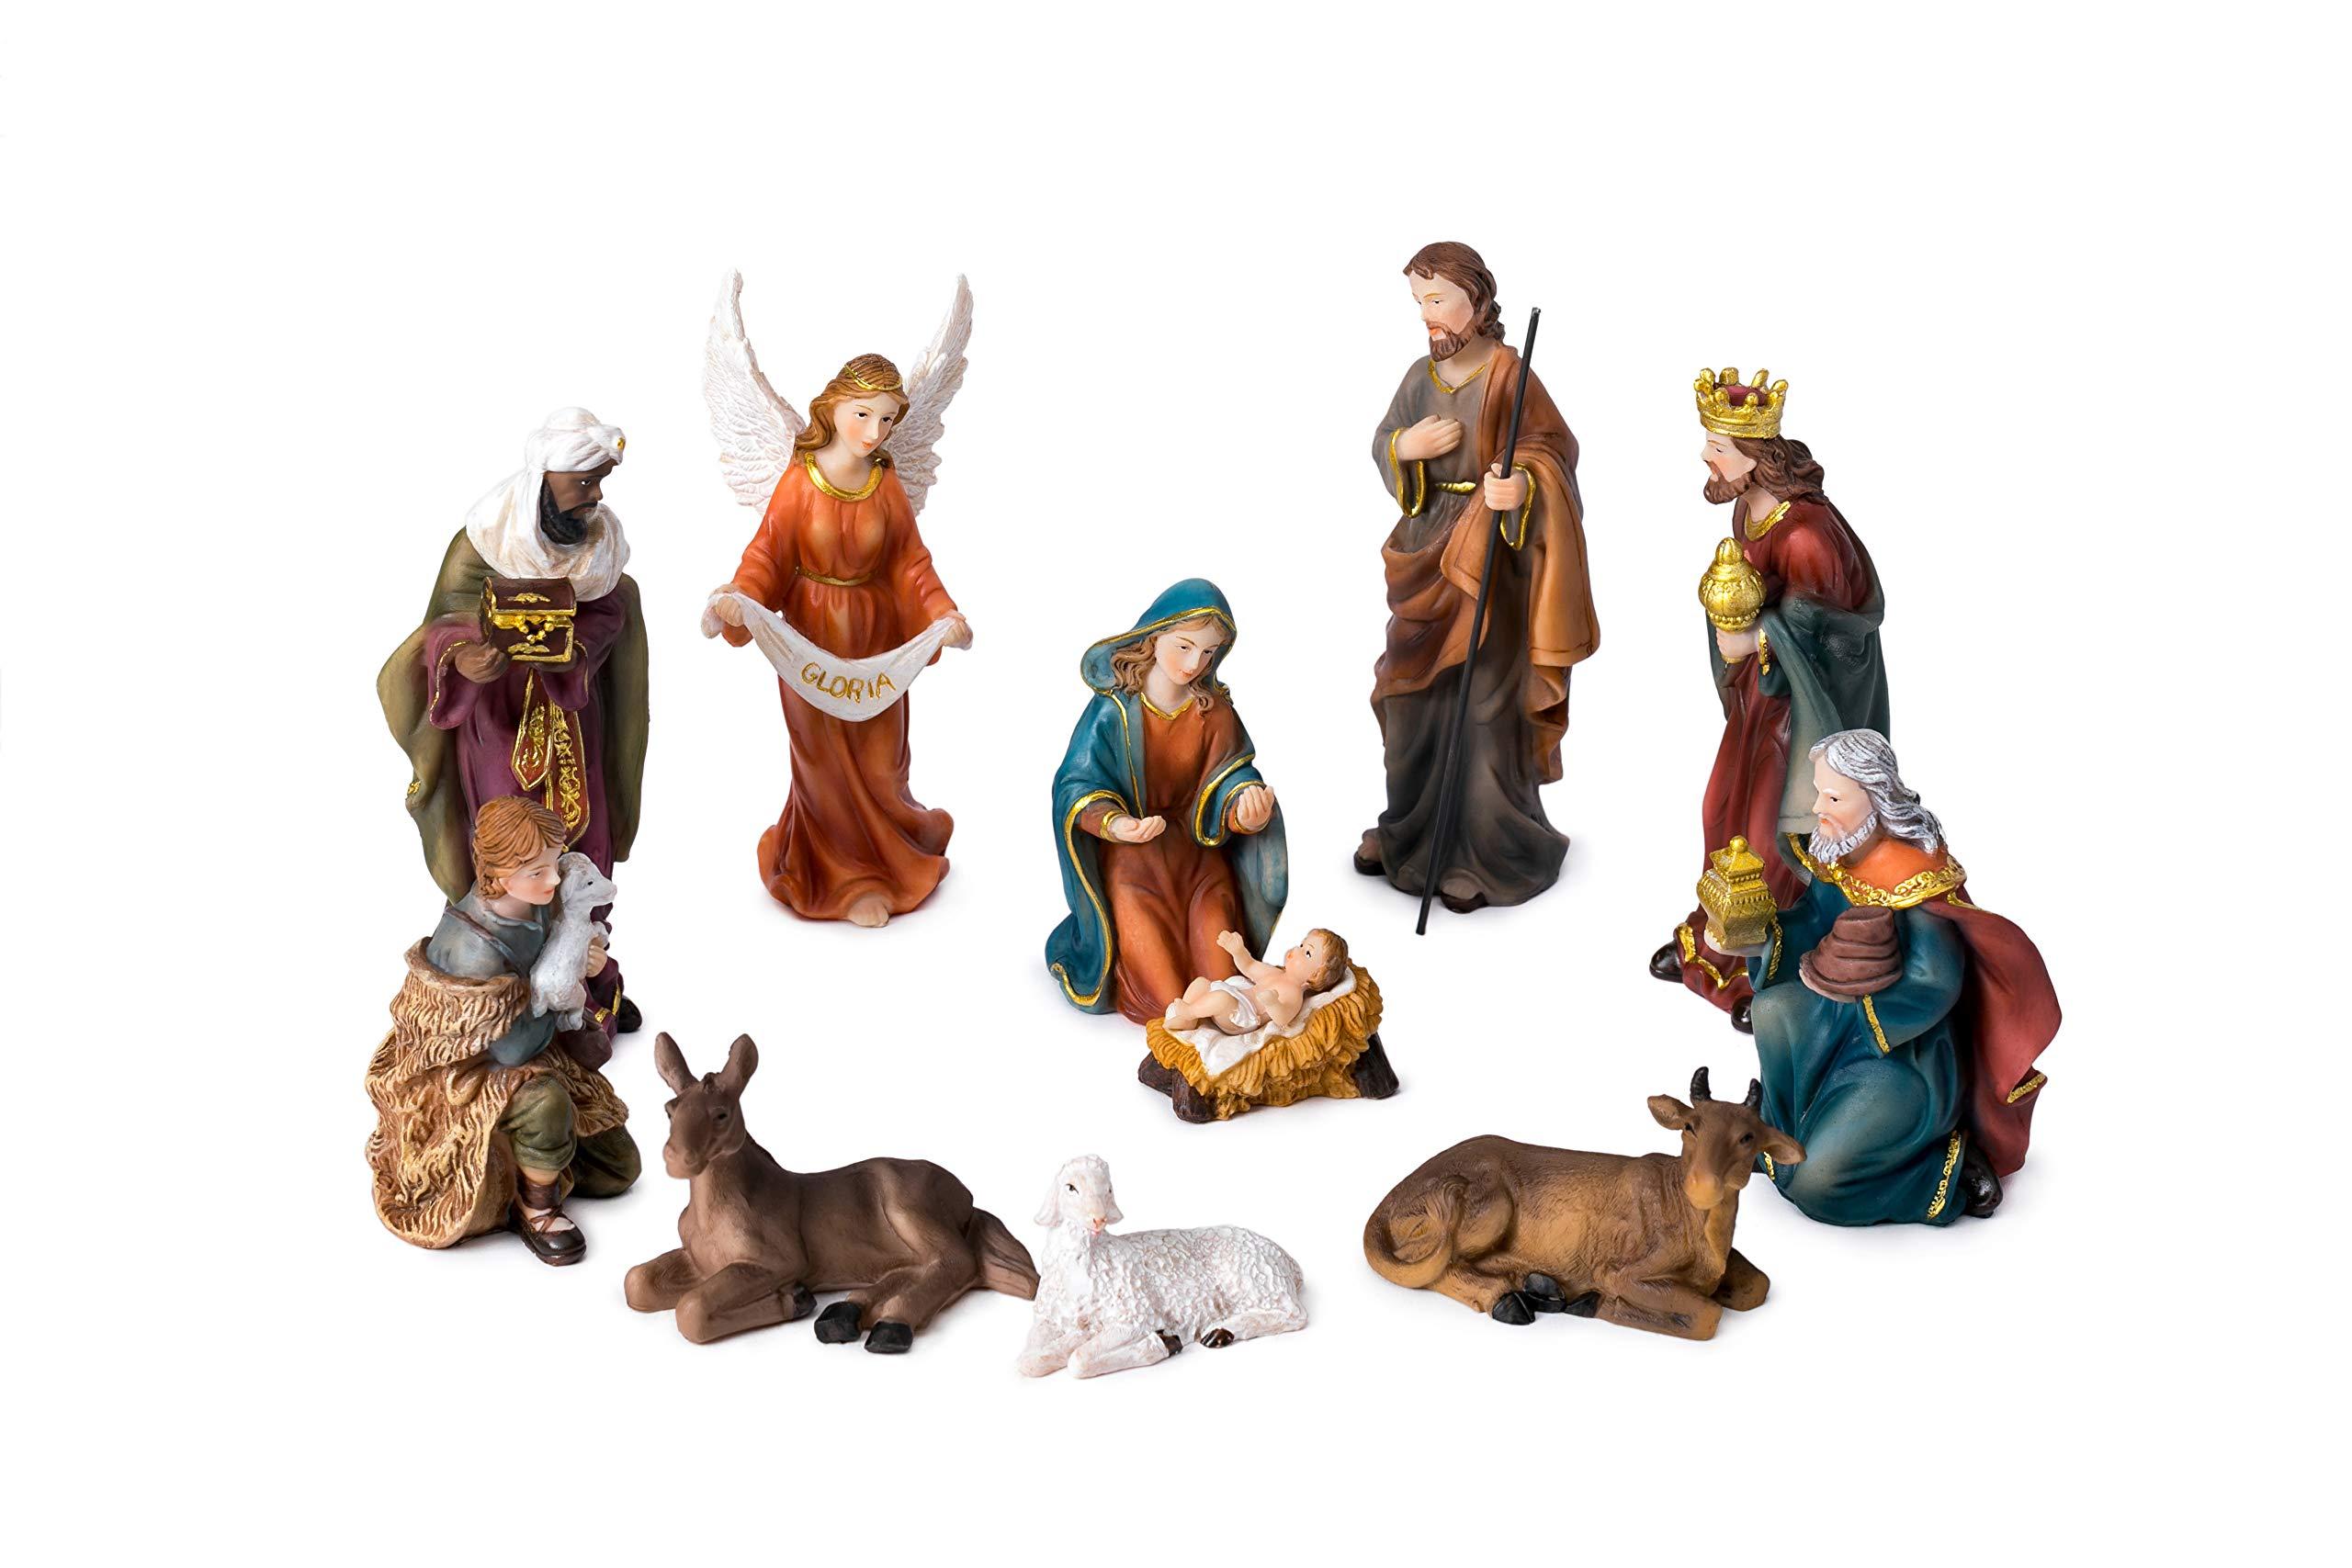 Joystarcraft Christmas Jesus Nativity Set Resin Hand-Painted Religious Christmas Nativity Figurine Tablepiece Set of 11